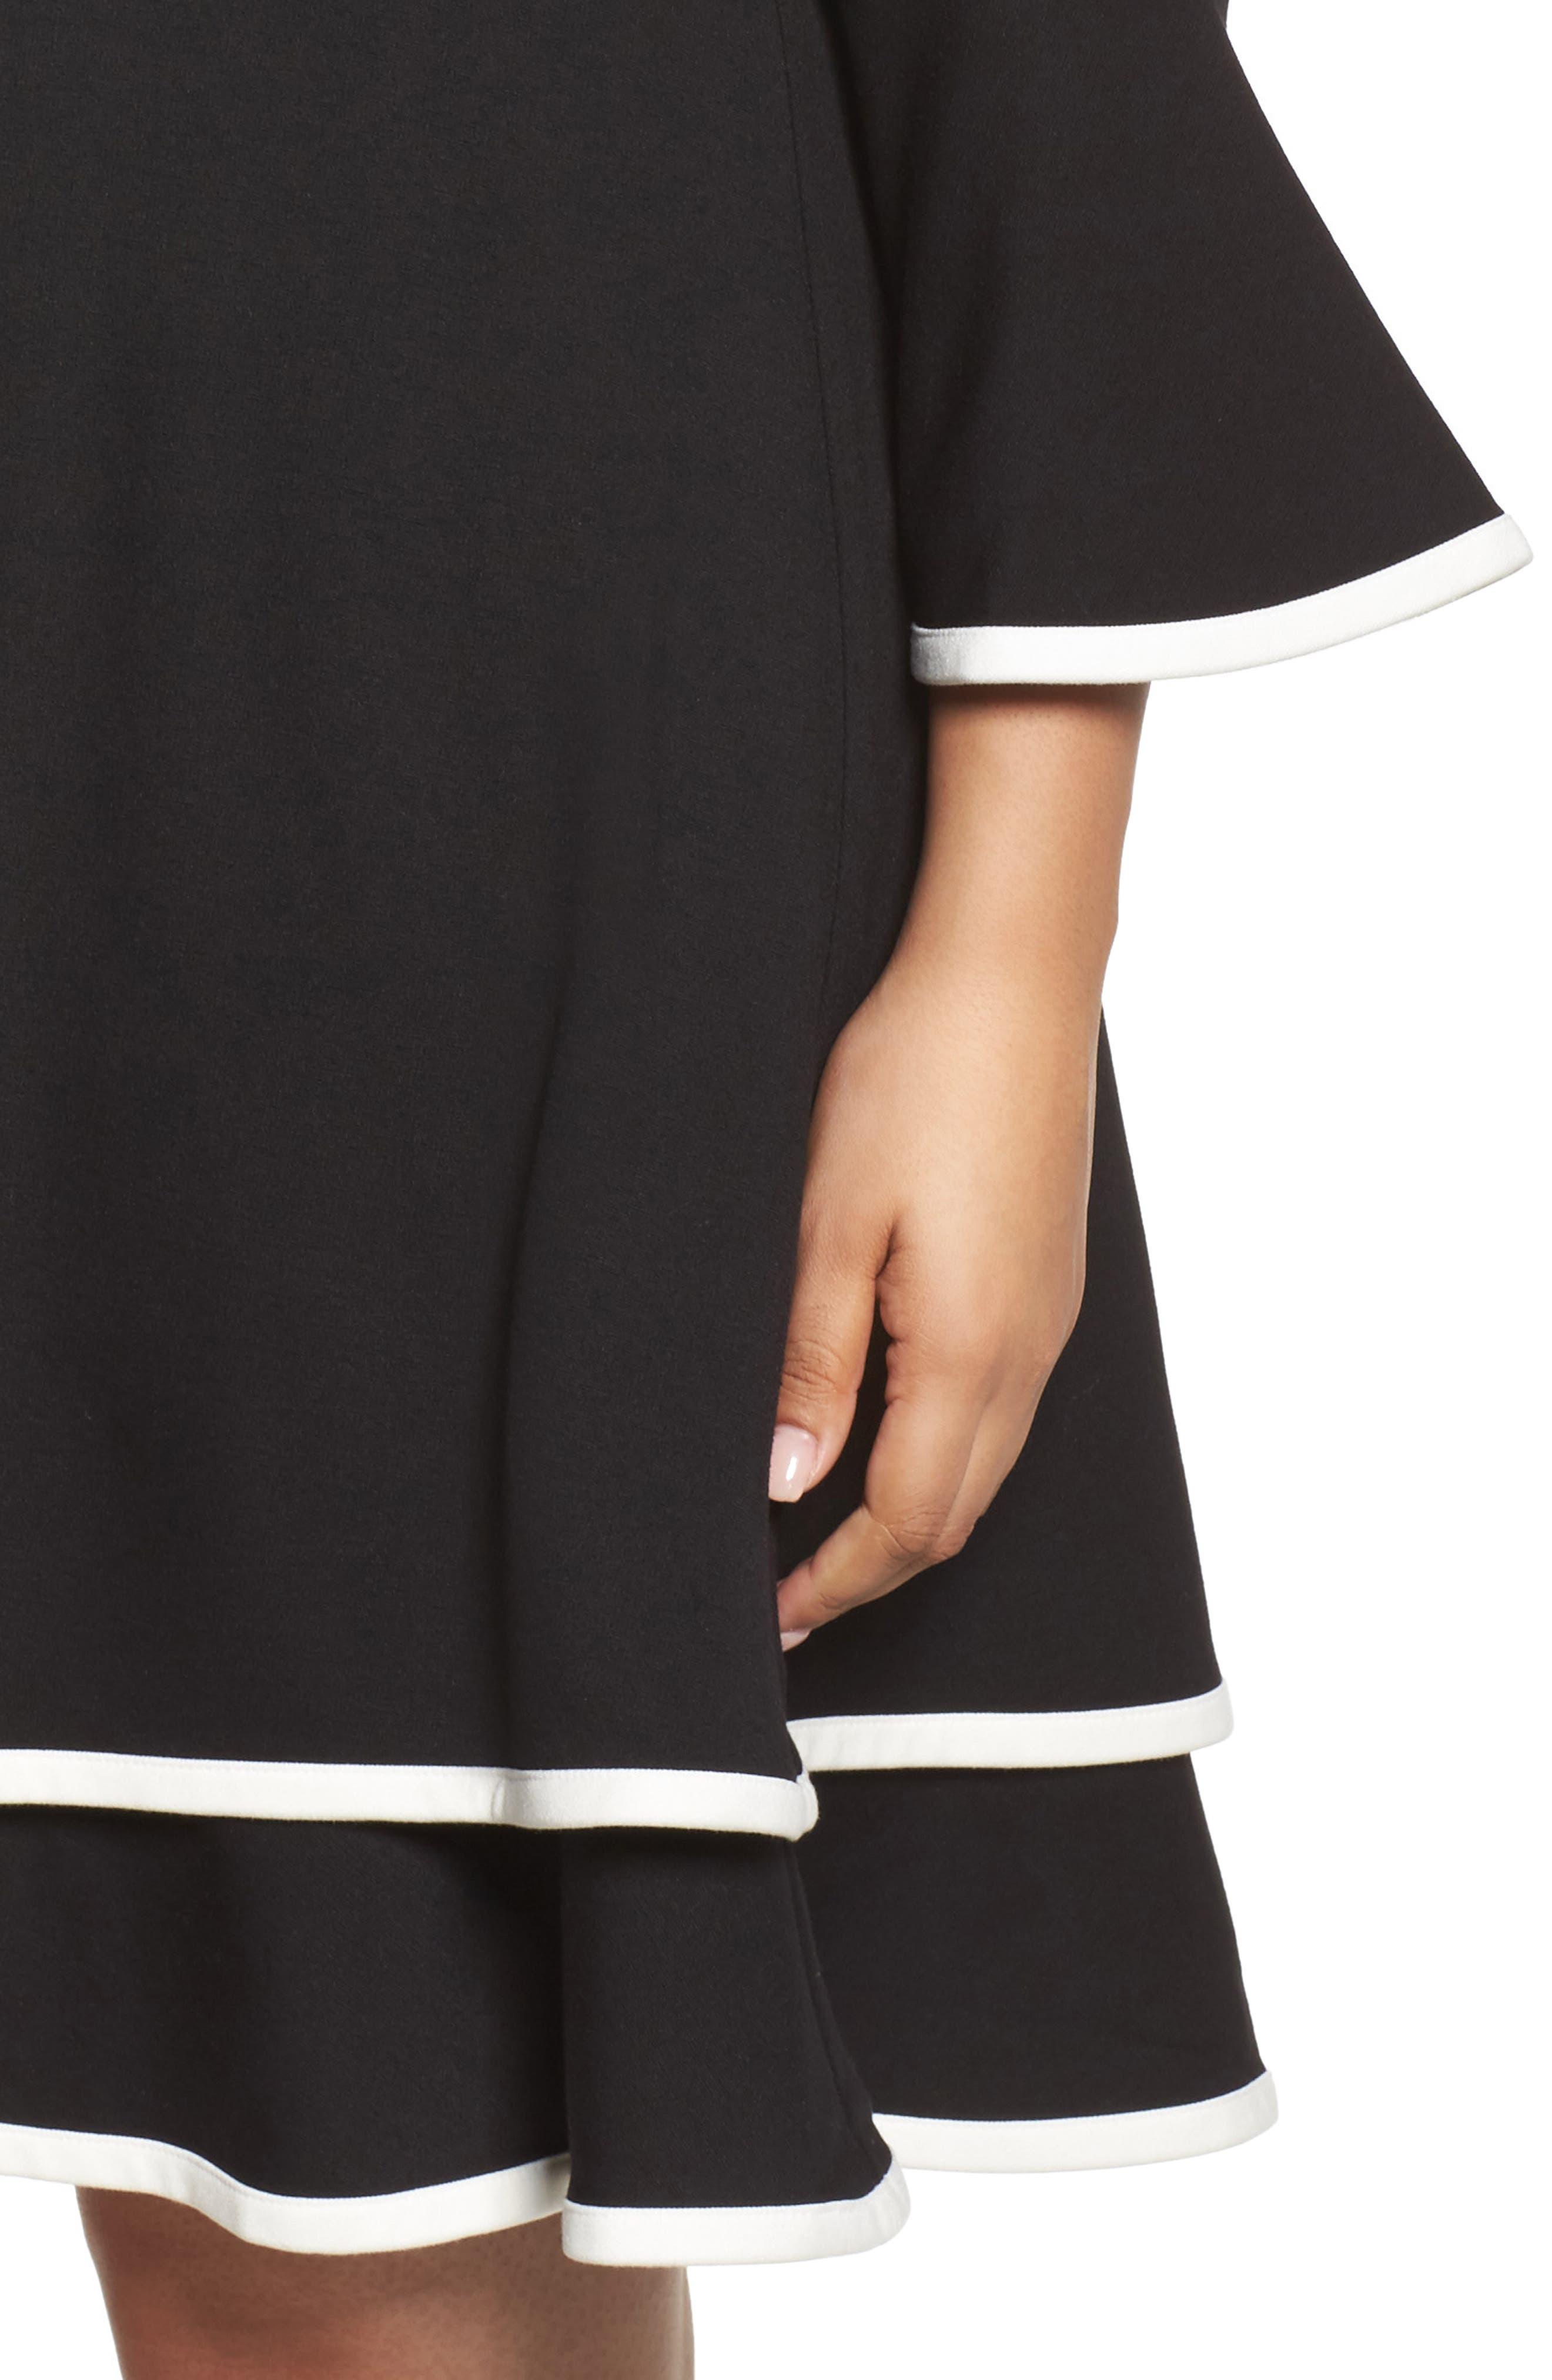 Bell Sleeve Contrast Trim Fit & Flare Dress,                             Alternate thumbnail 4, color,                             BLACK/ IVORY